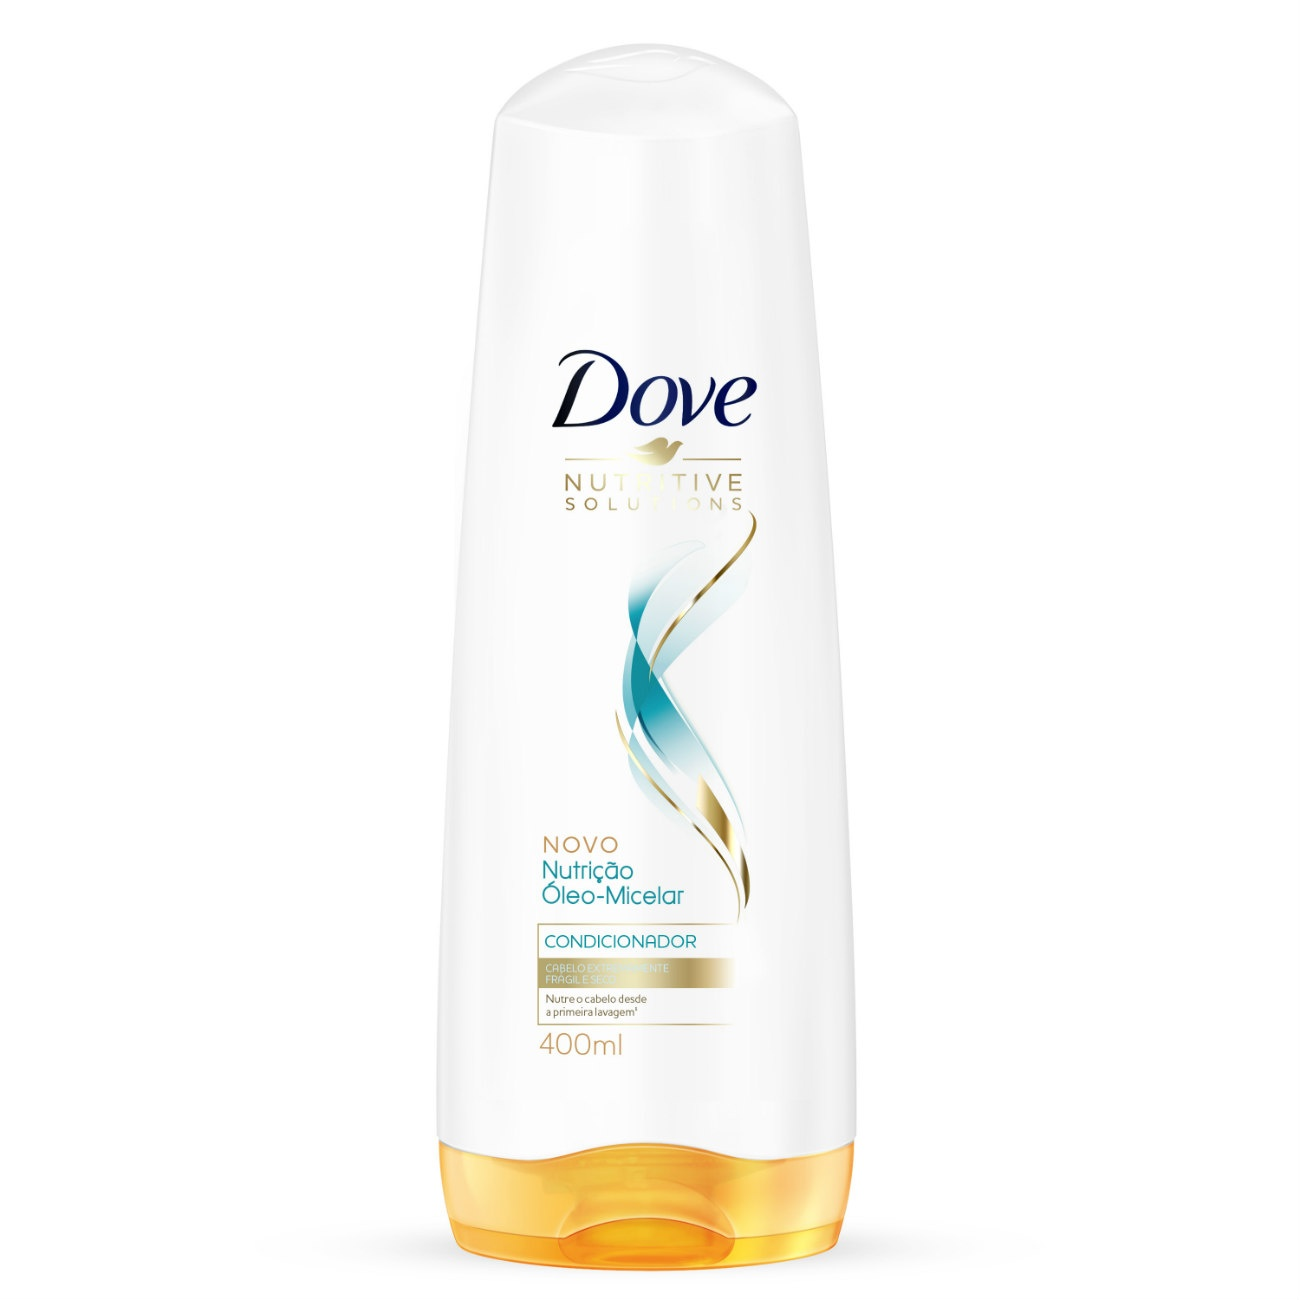 Condicionador Dove Nutri��o �leo-Micelar 400ml